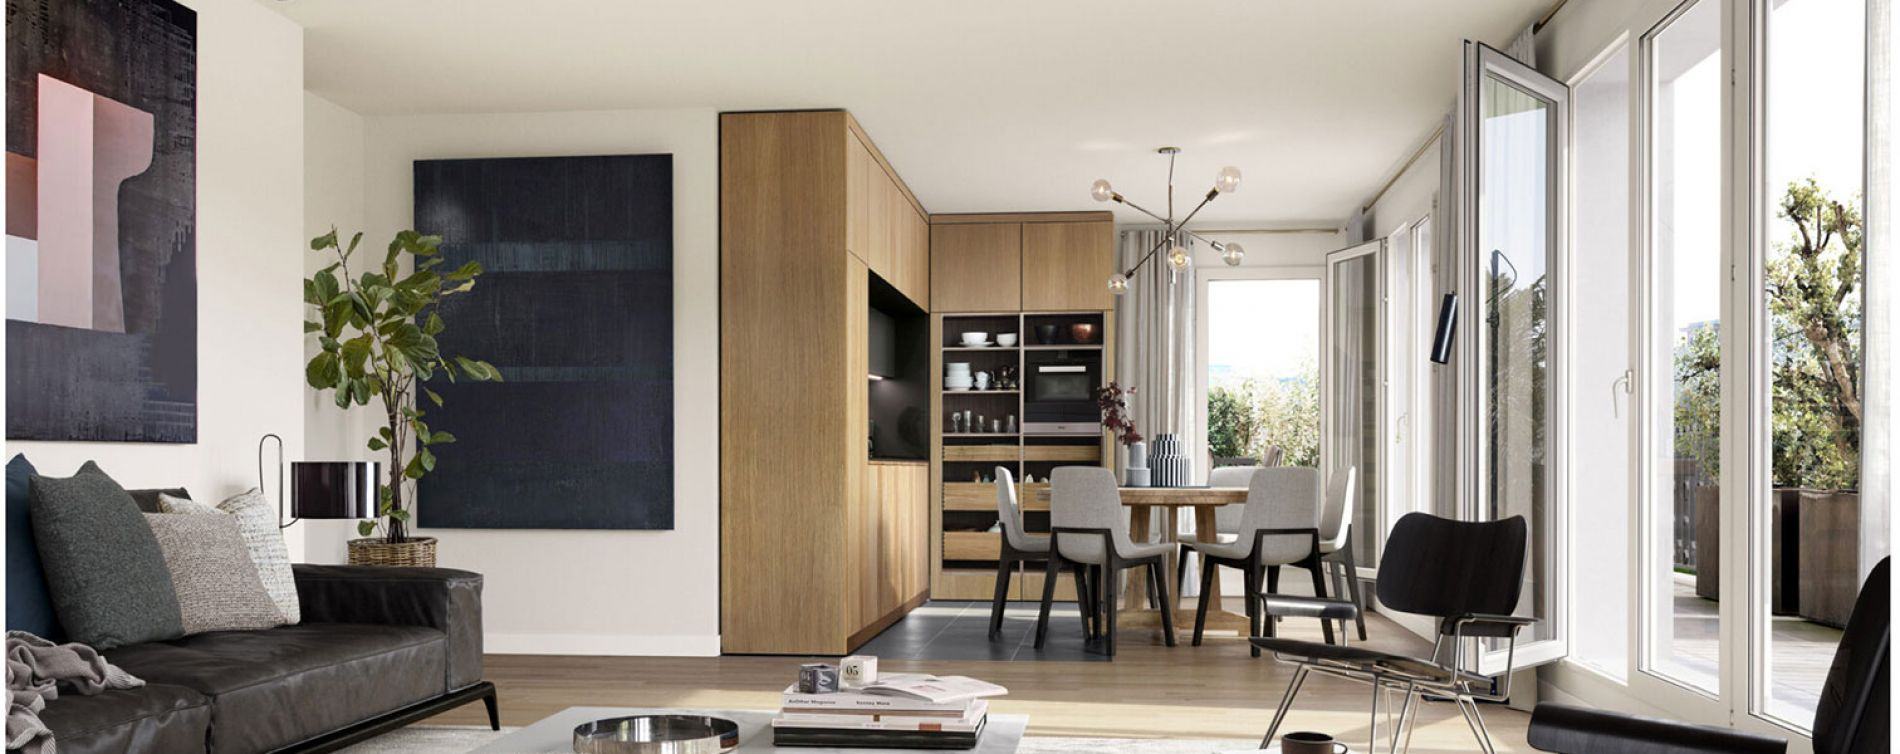 Le Blanc-Mesnil : programme immobilier neuve « Programme immobilier n°218736 » en Loi Pinel (4)